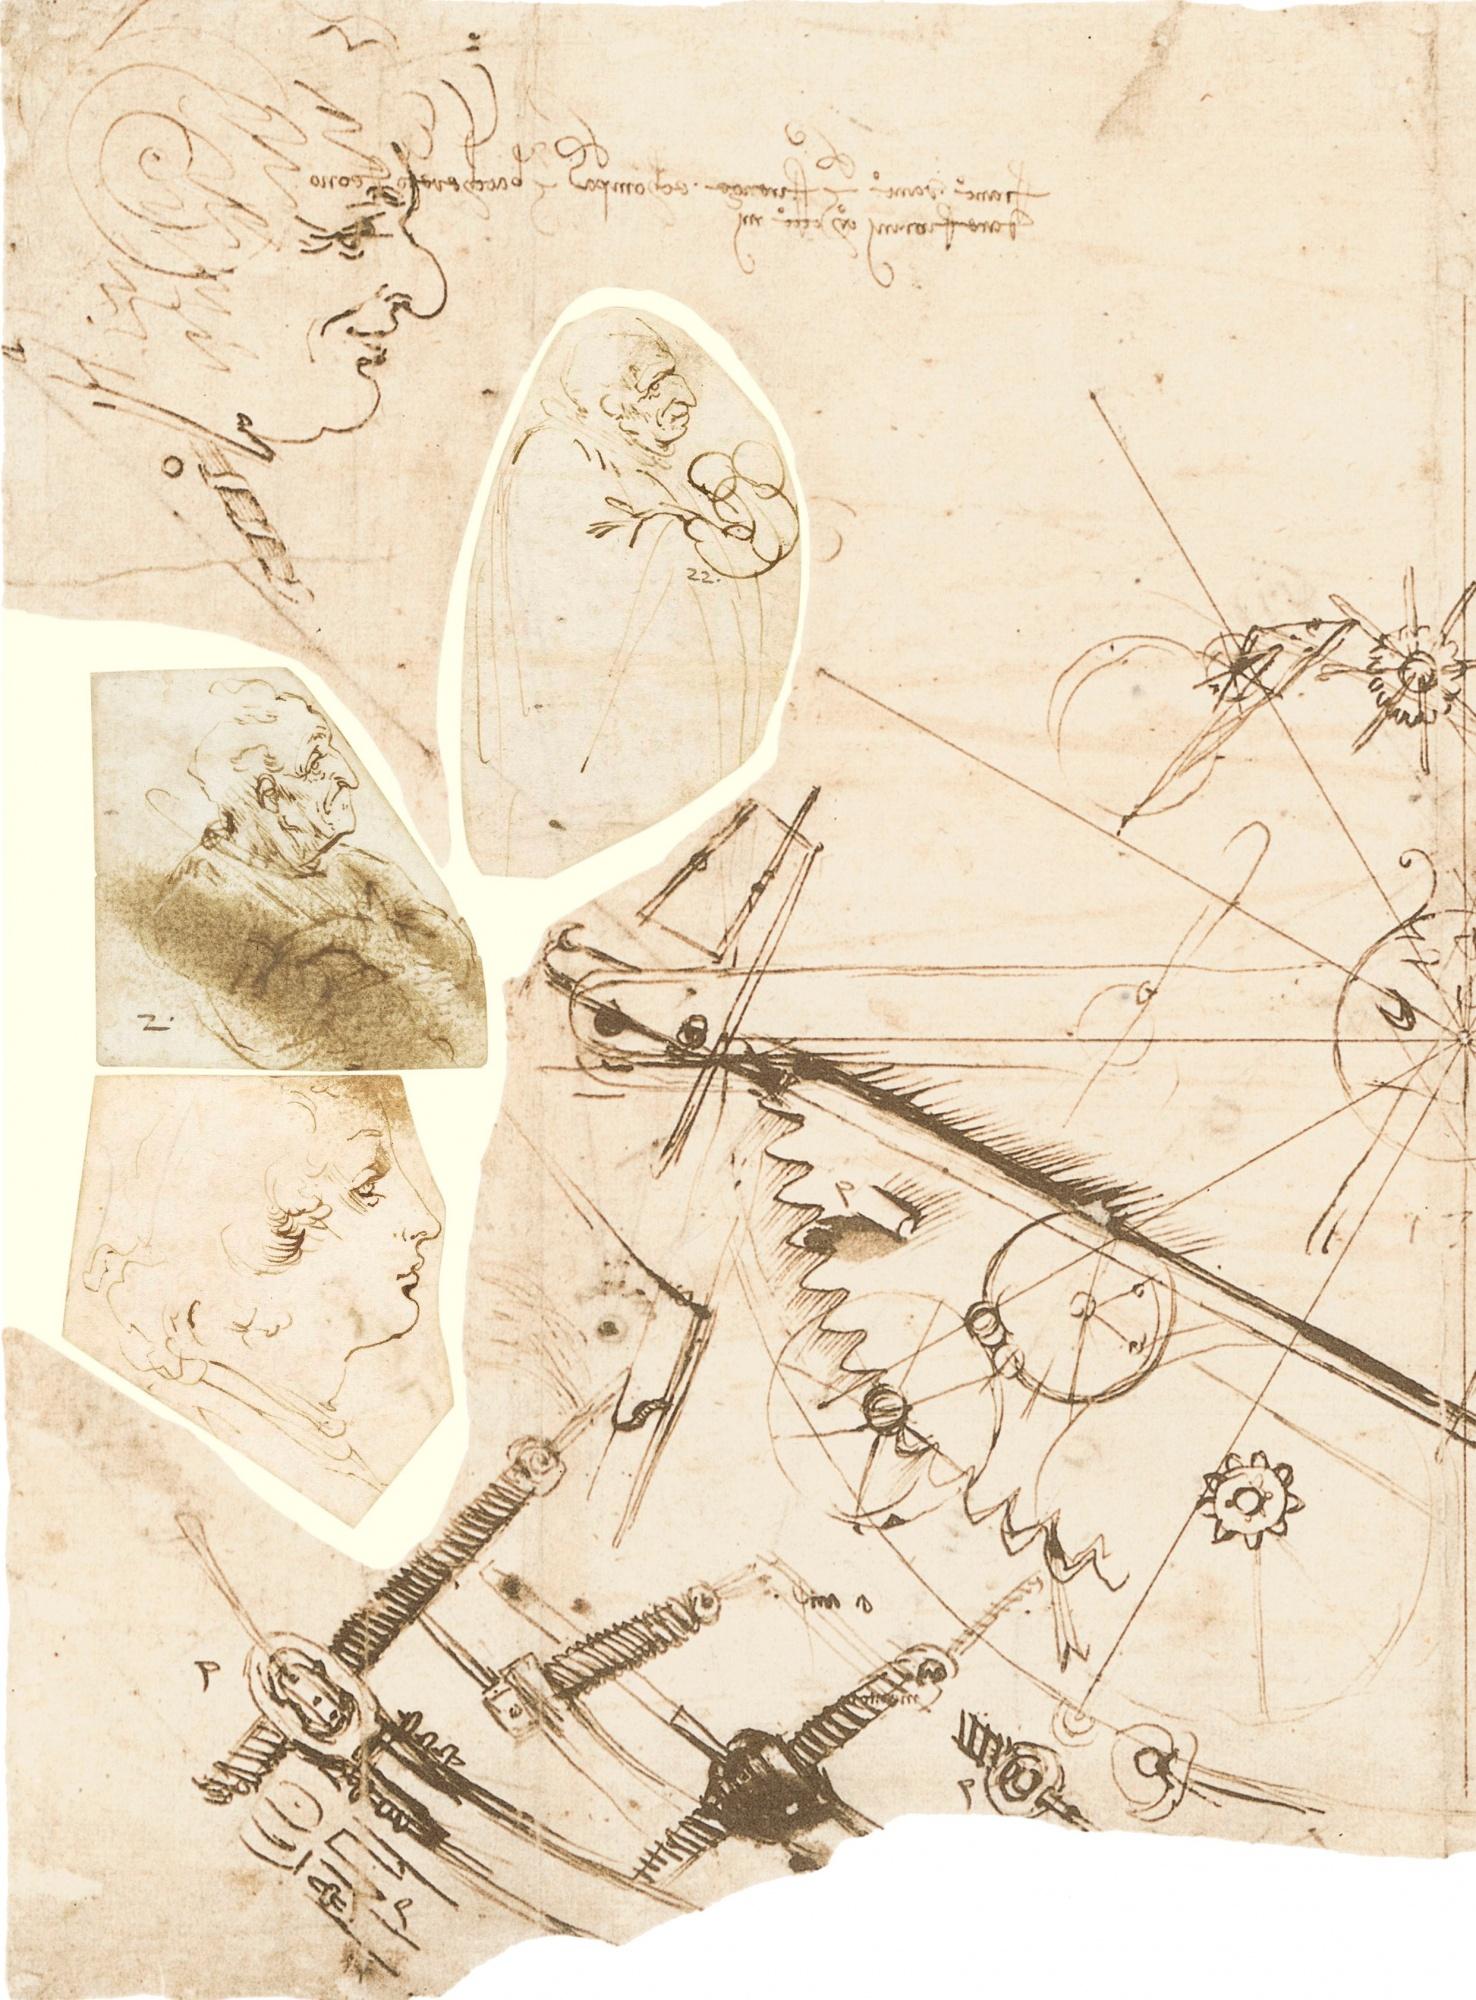 A detail taken from Codex Atlanticus of Leonardo da Vinci